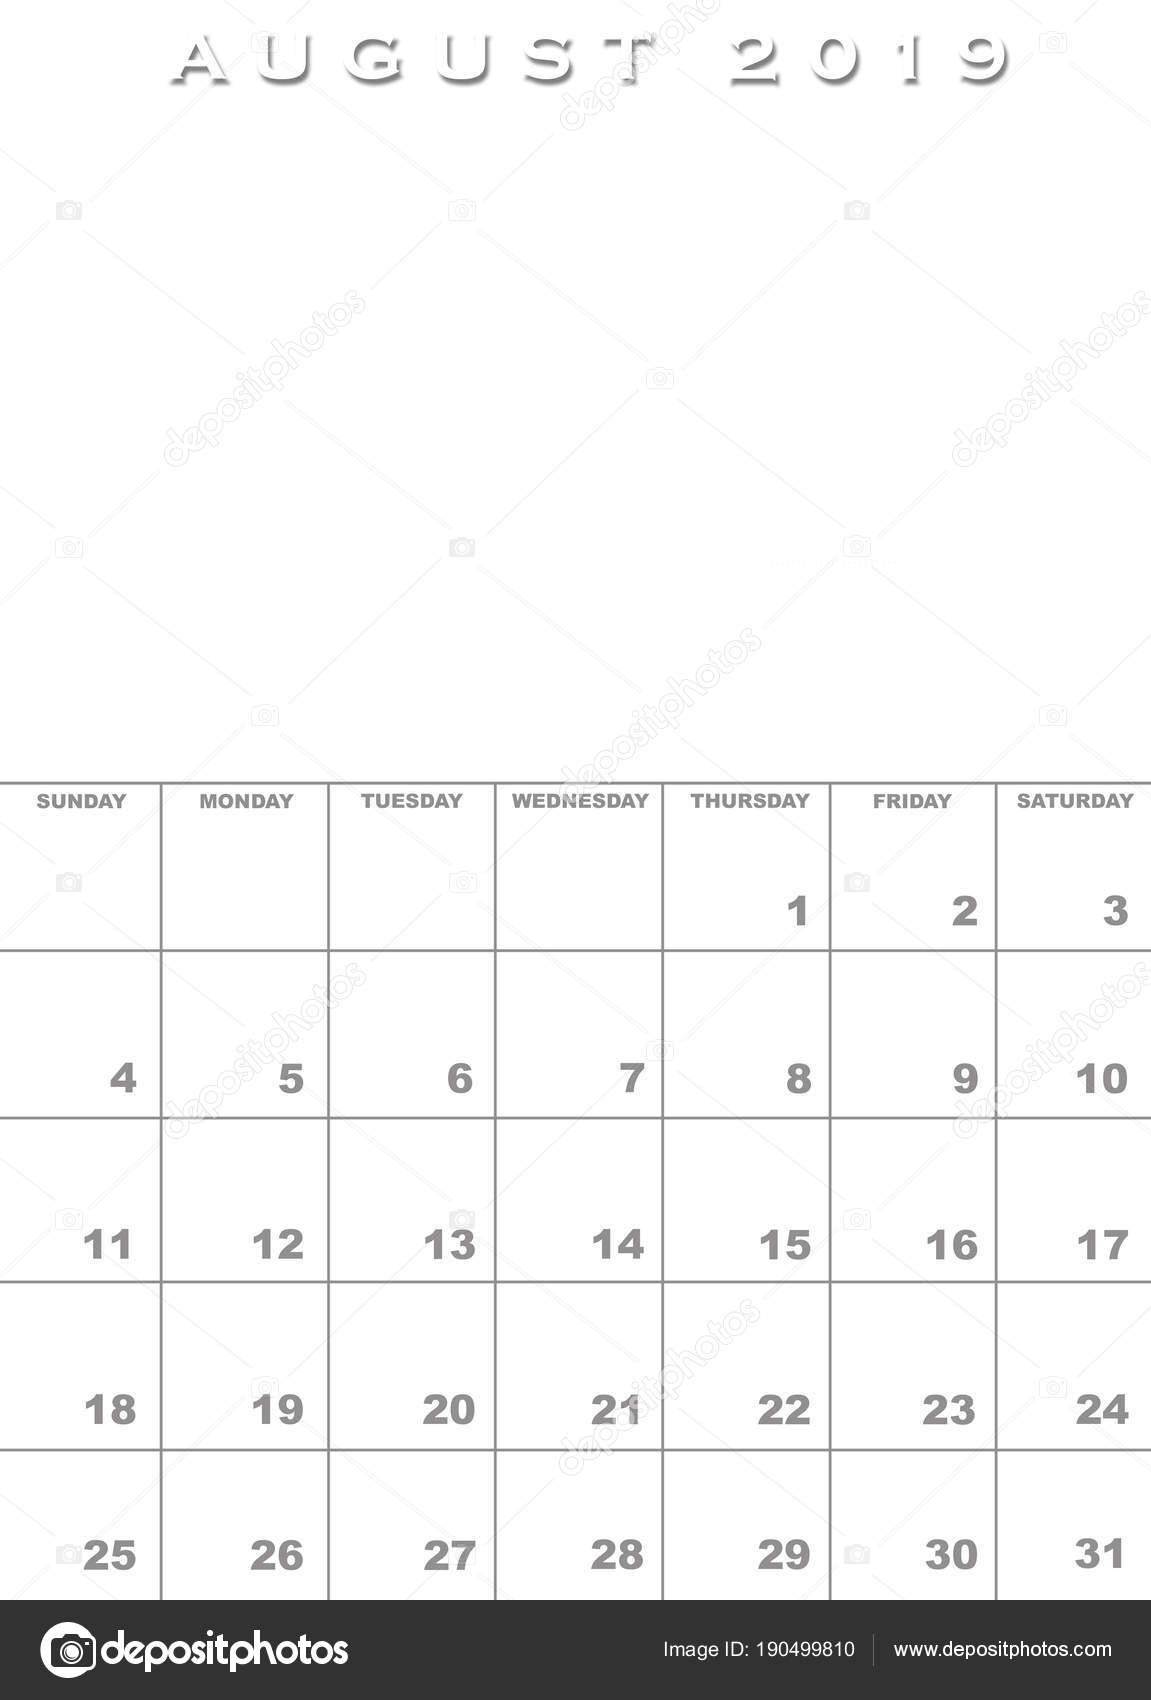 Kalendervorlage August 2019 — Stockfoto © paulvinten #190499810